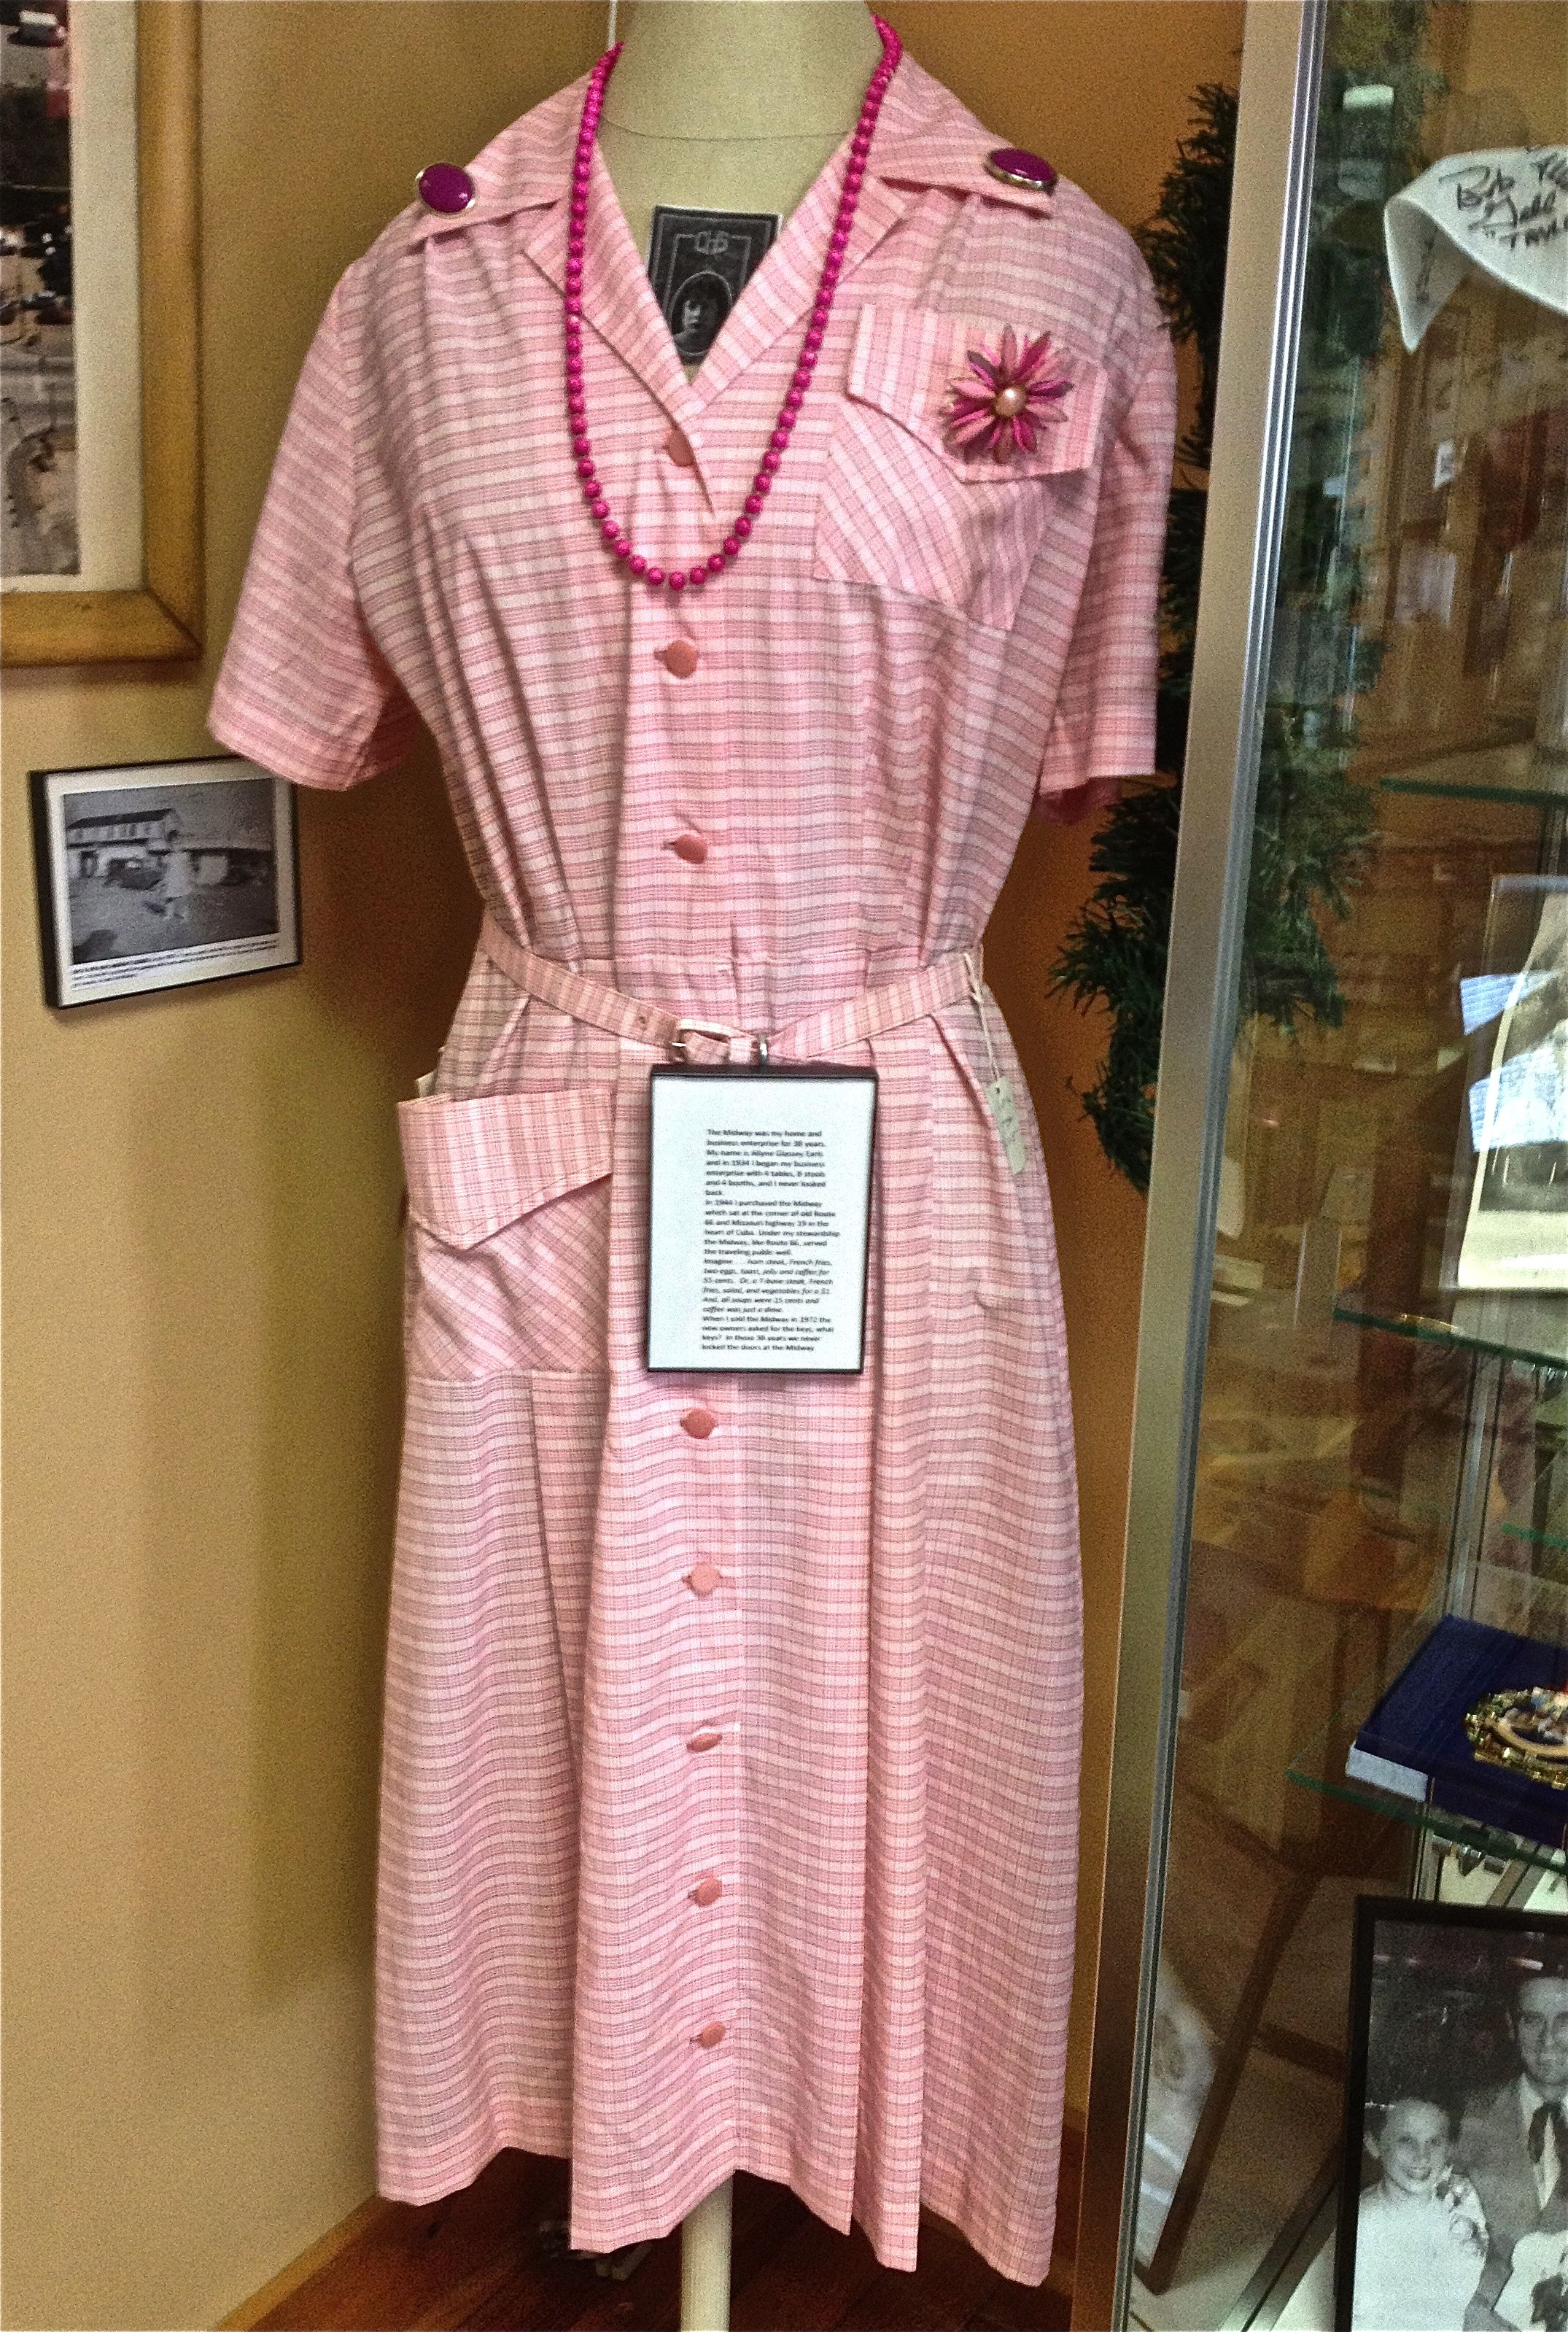 motel uniforms 1950s - Google Search | Mountaintop Research | Pinterest